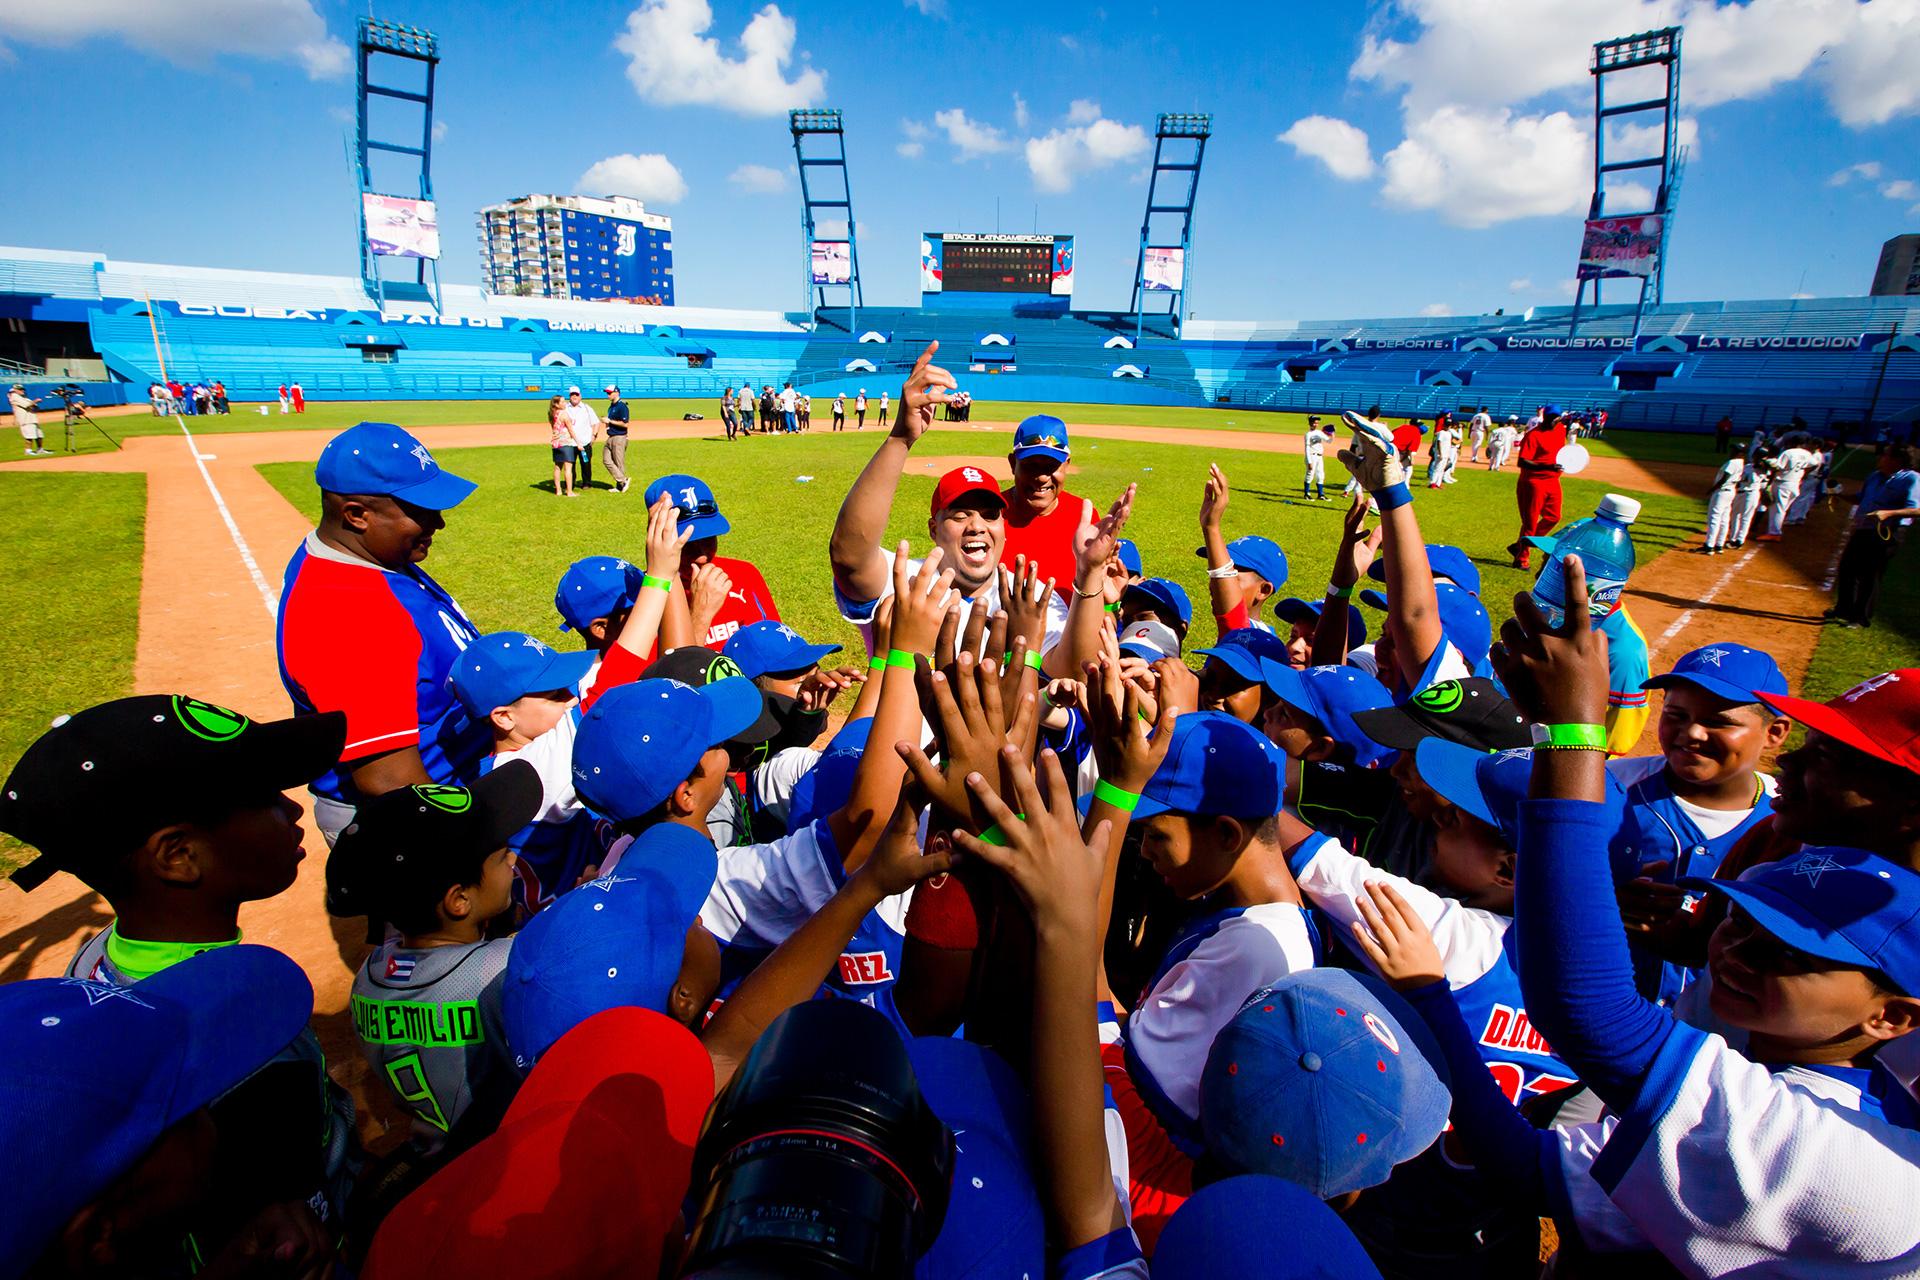 2015.12.15_PLAYERSTRIBUNE_CUBA_0135